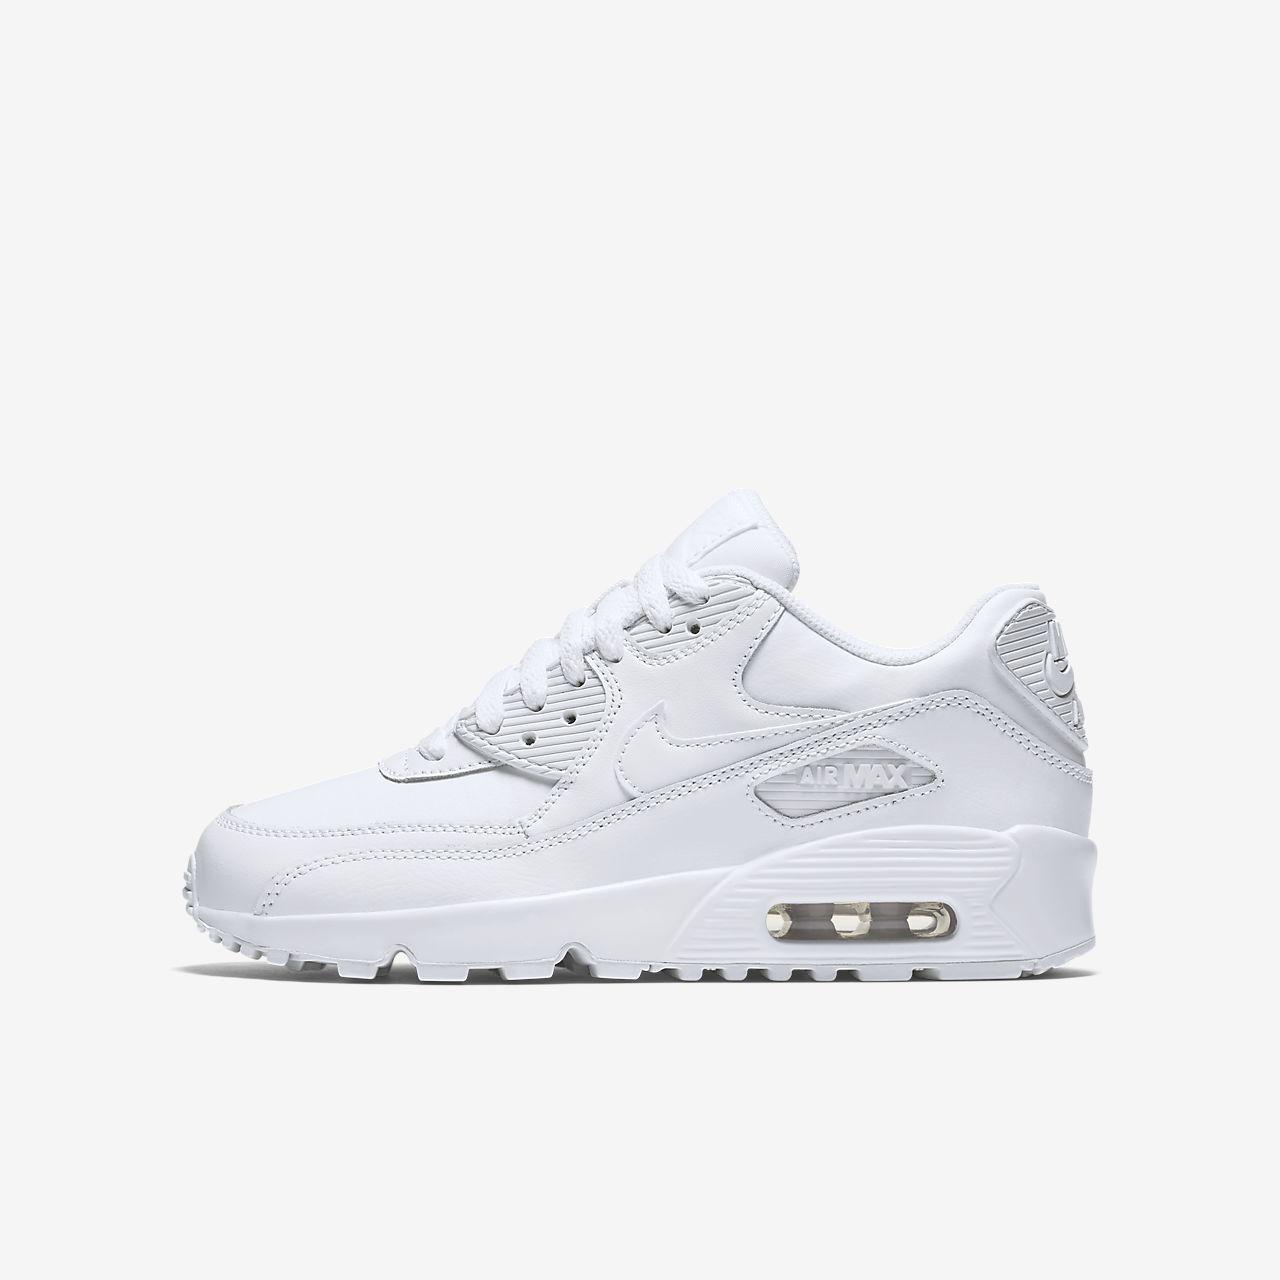 Nike Air Max 90 Leather Big Kids' Shoe